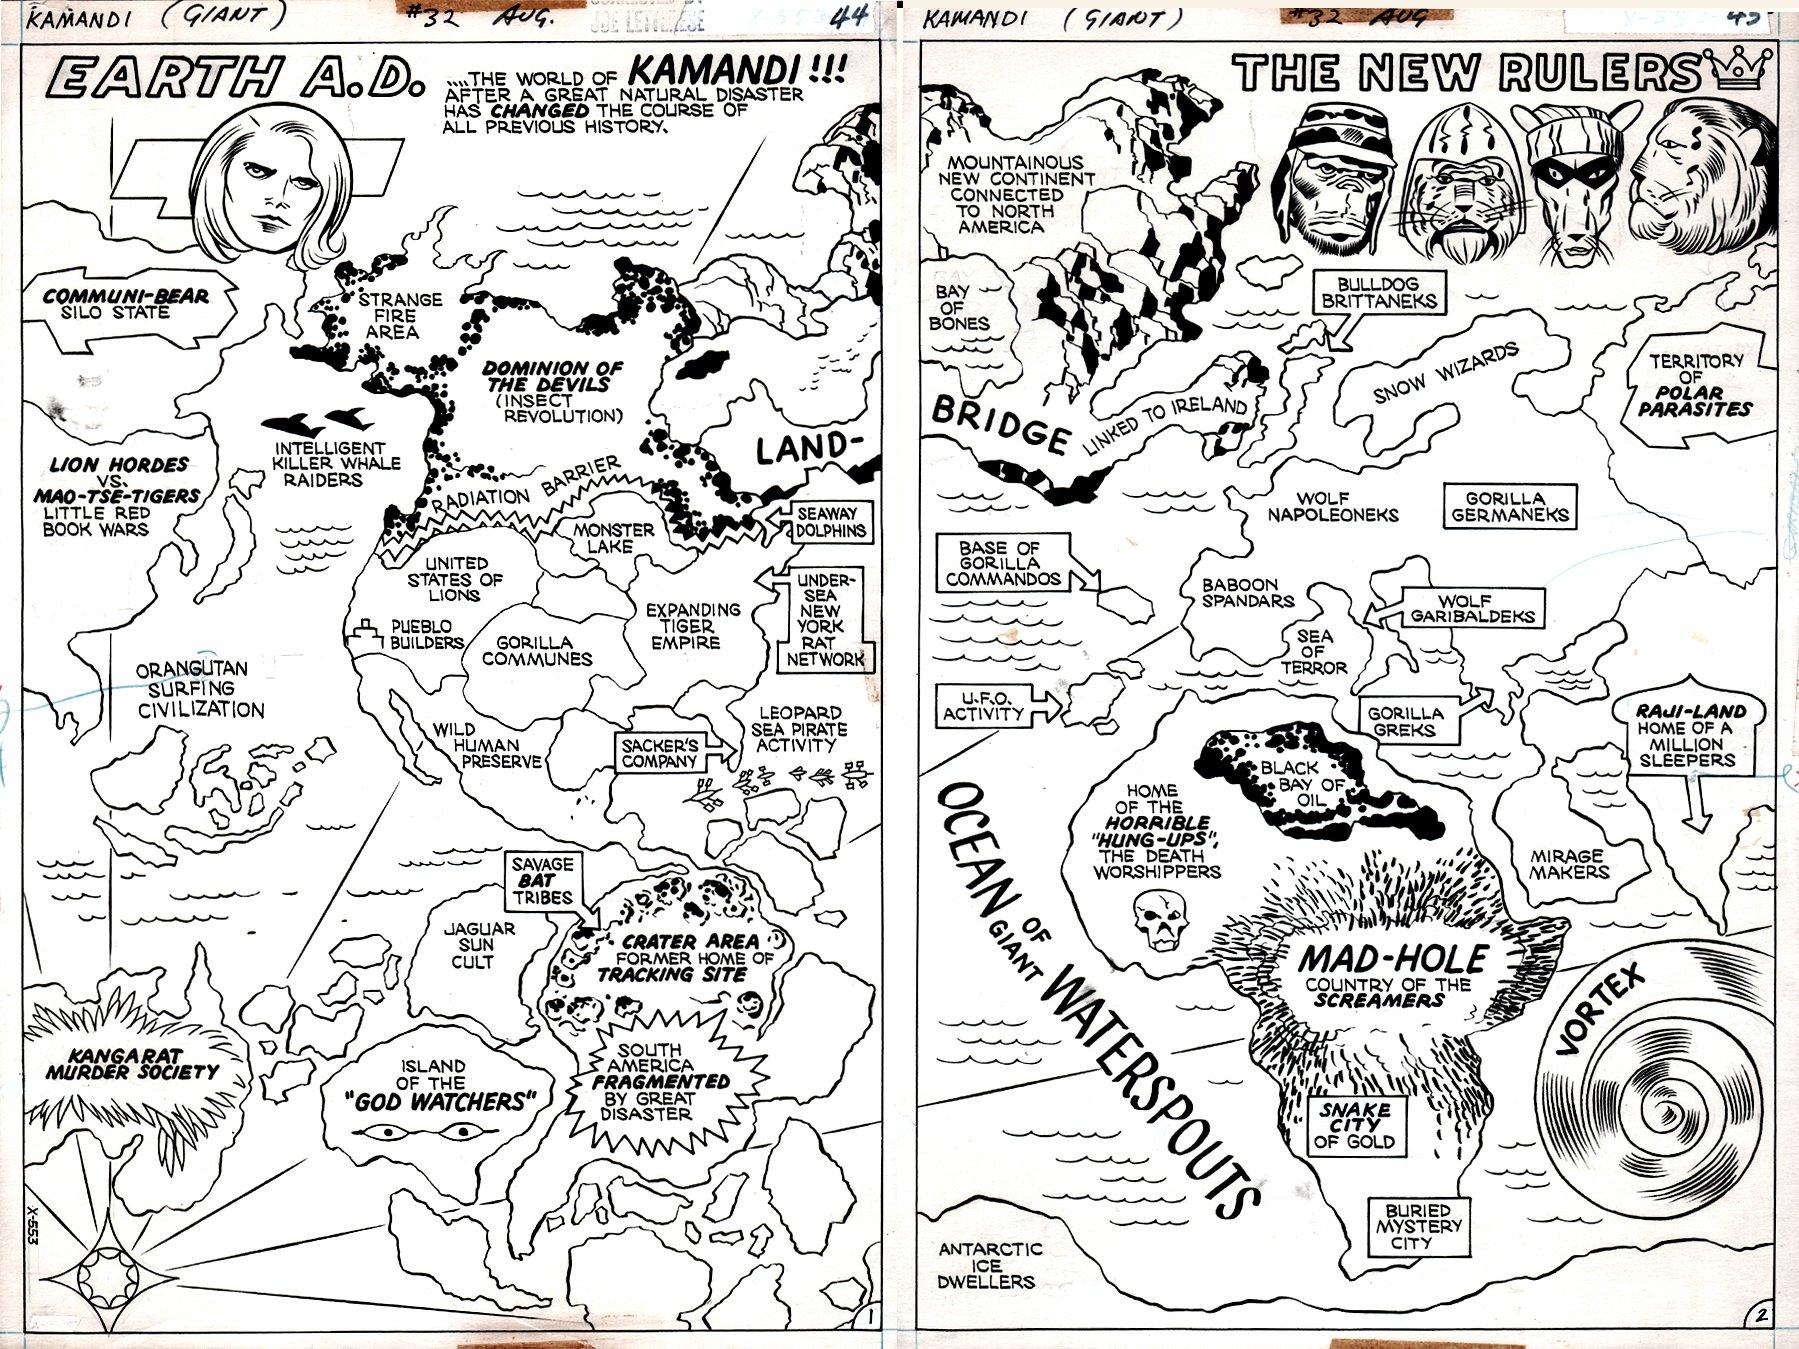 Kamandi #32 p 44-45 (2 SPLASH PAGES!) 1975